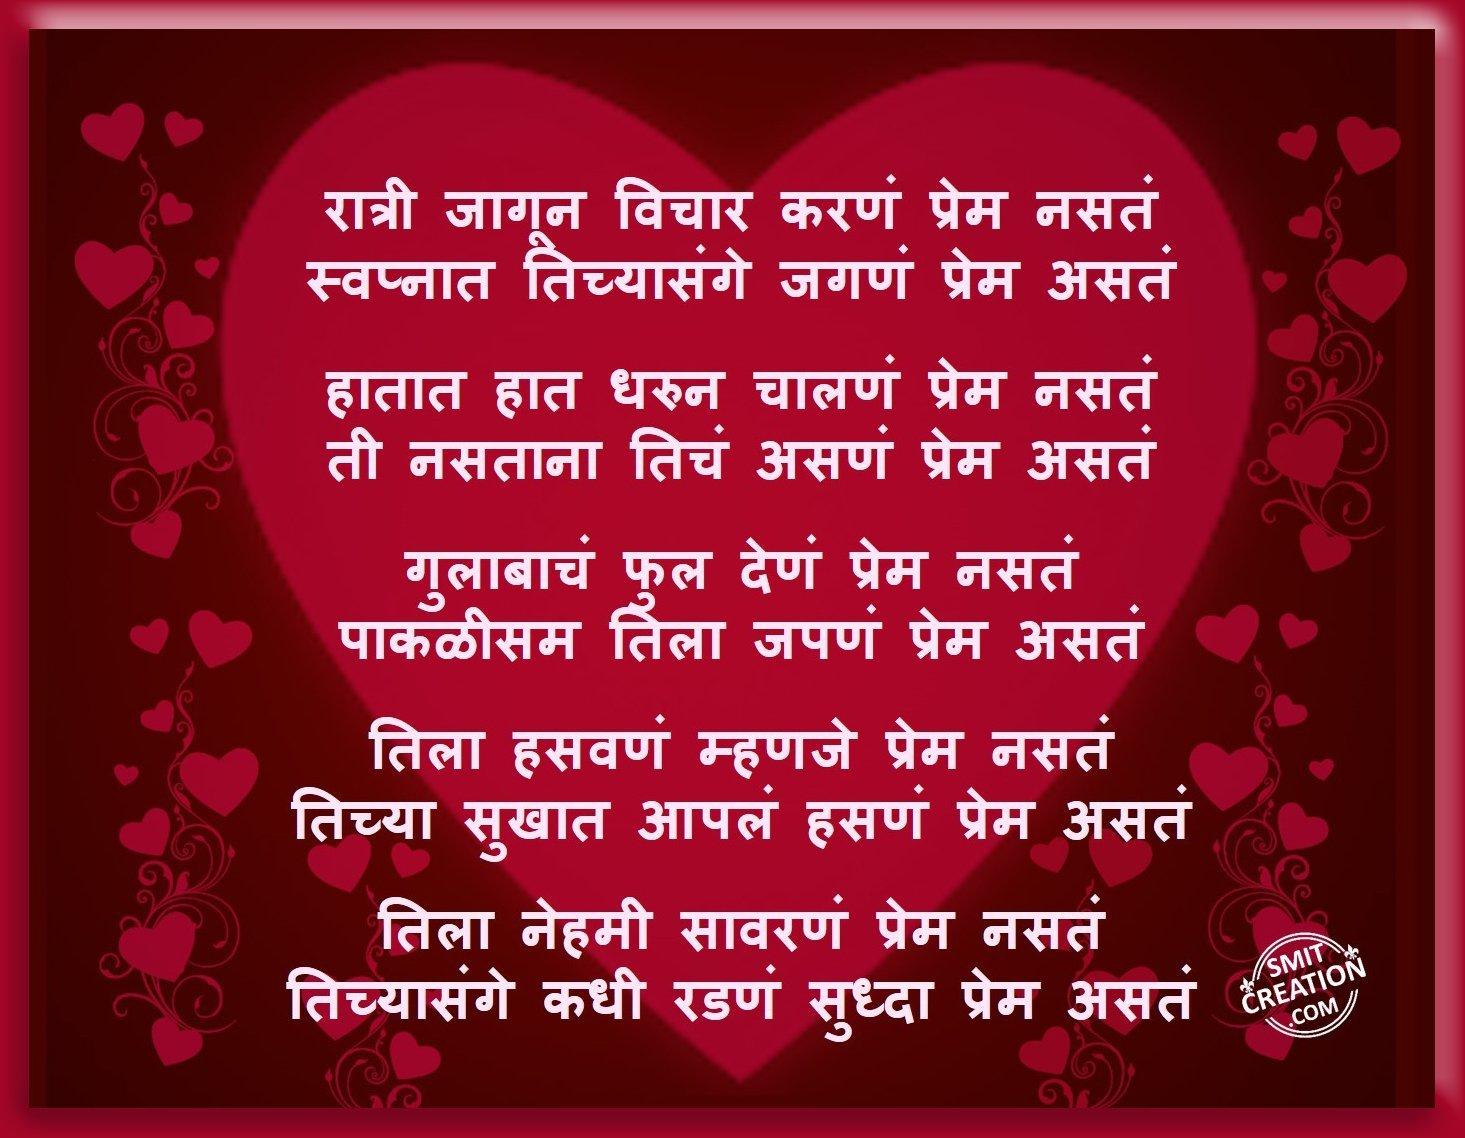 Marathi Shayari Pictures And Graphics